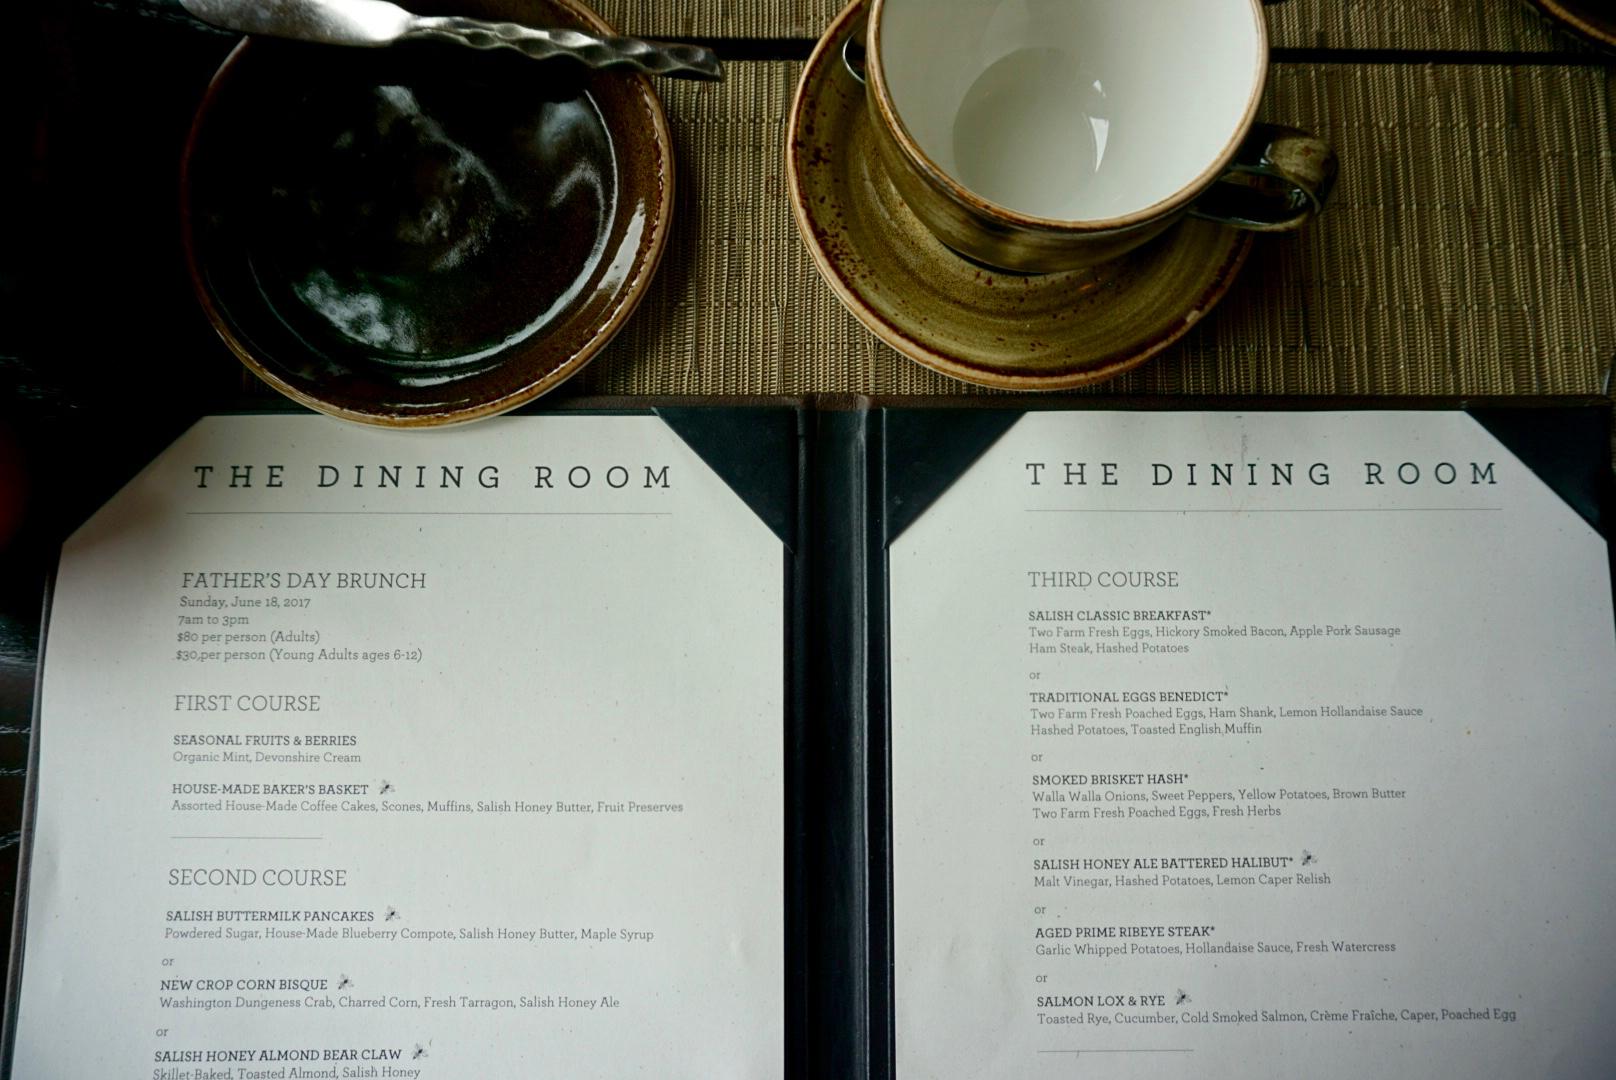 Salish Lodge The Dining Room 10.jpg